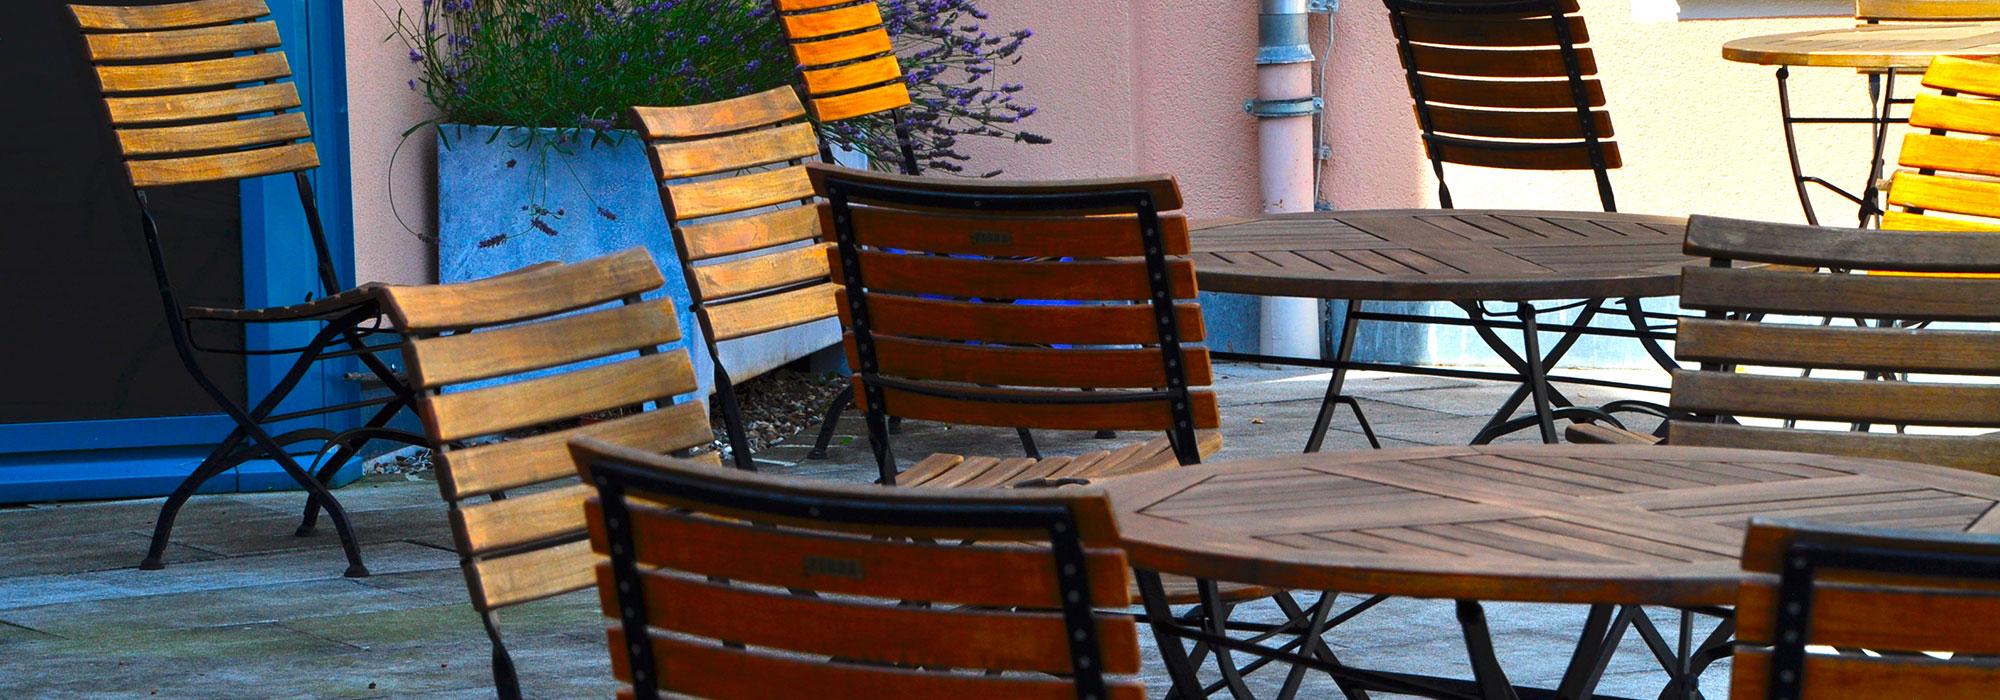 7_Terrasse-im-Sommer